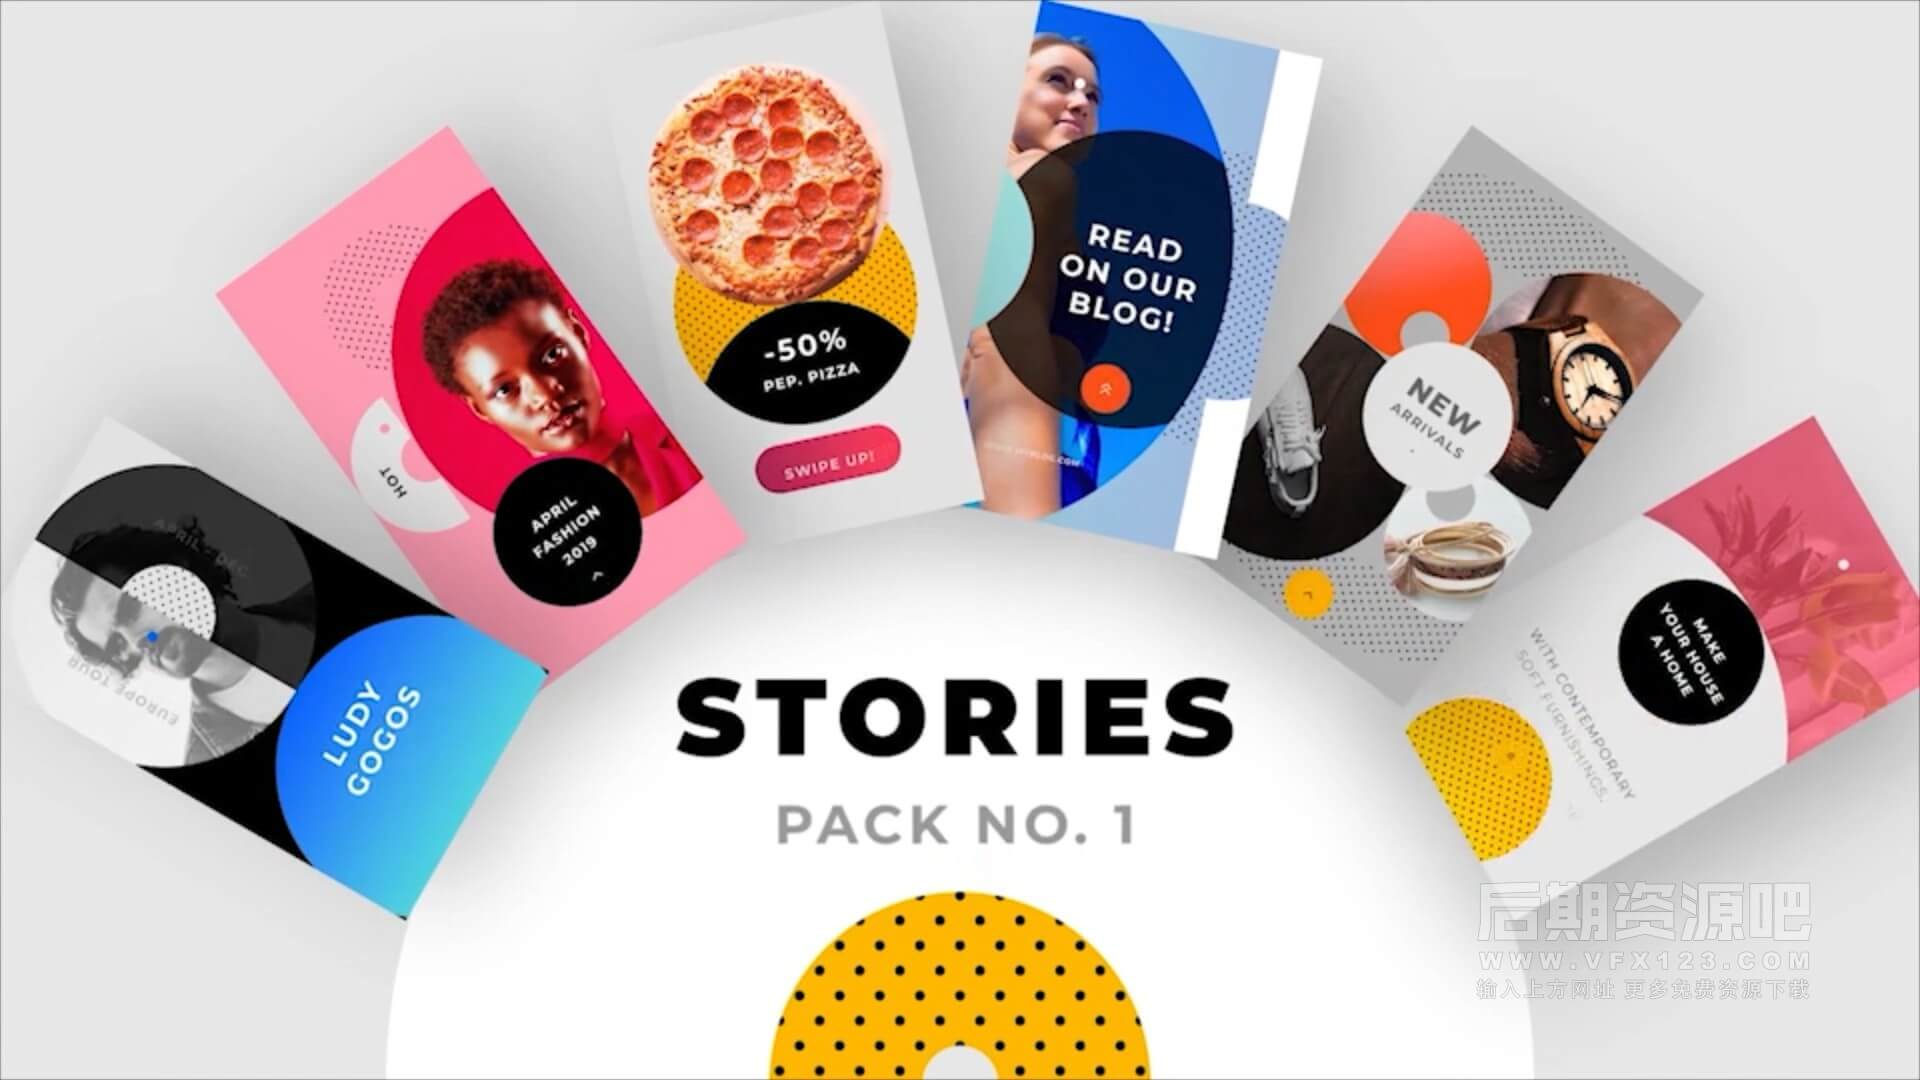 fcpx竖屏模板 6组时尚现代手机短视频促销片头模板 Instagram Stories 2